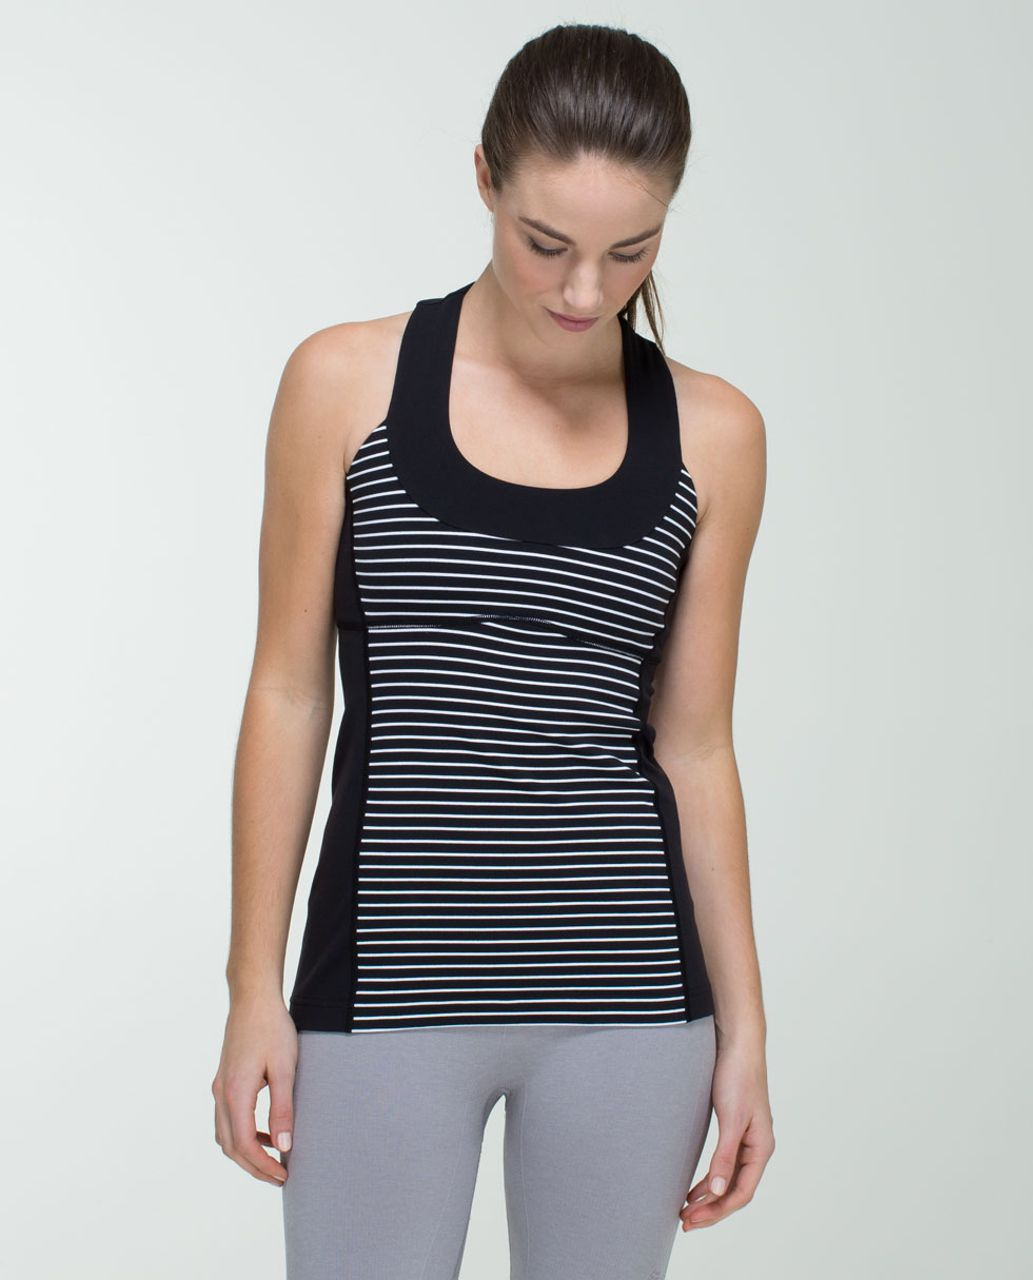 Lululemon Scoop Neck Tank *Luon - Parallel Stripe Black White / Black